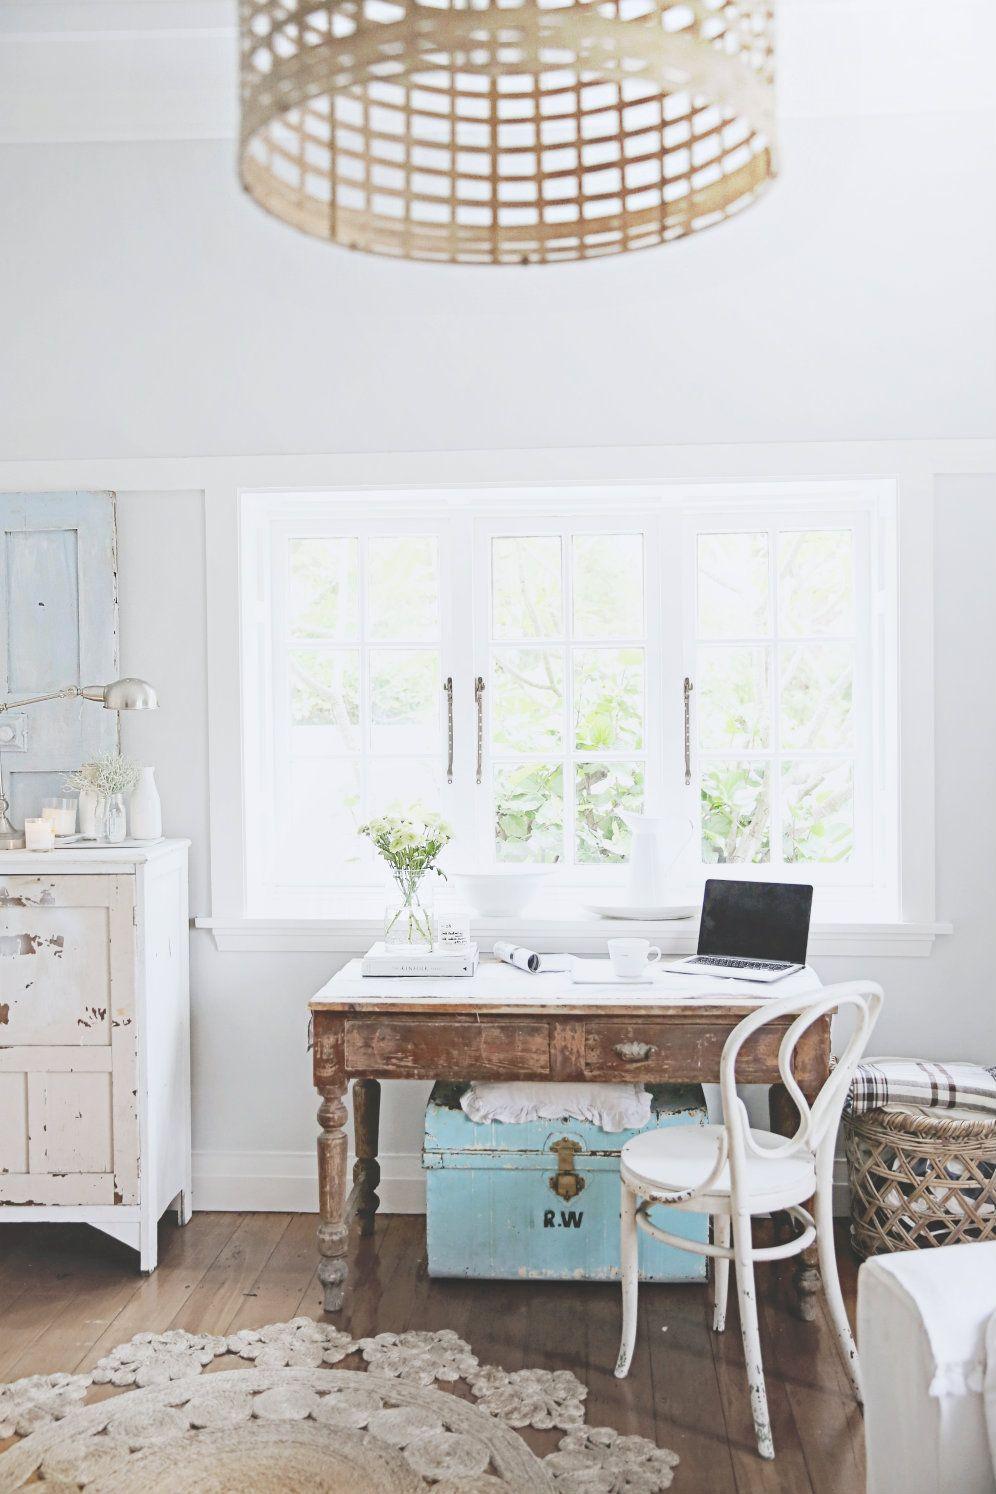 Vintage Desks After The Storm Beach Cottage Decor Home Interior